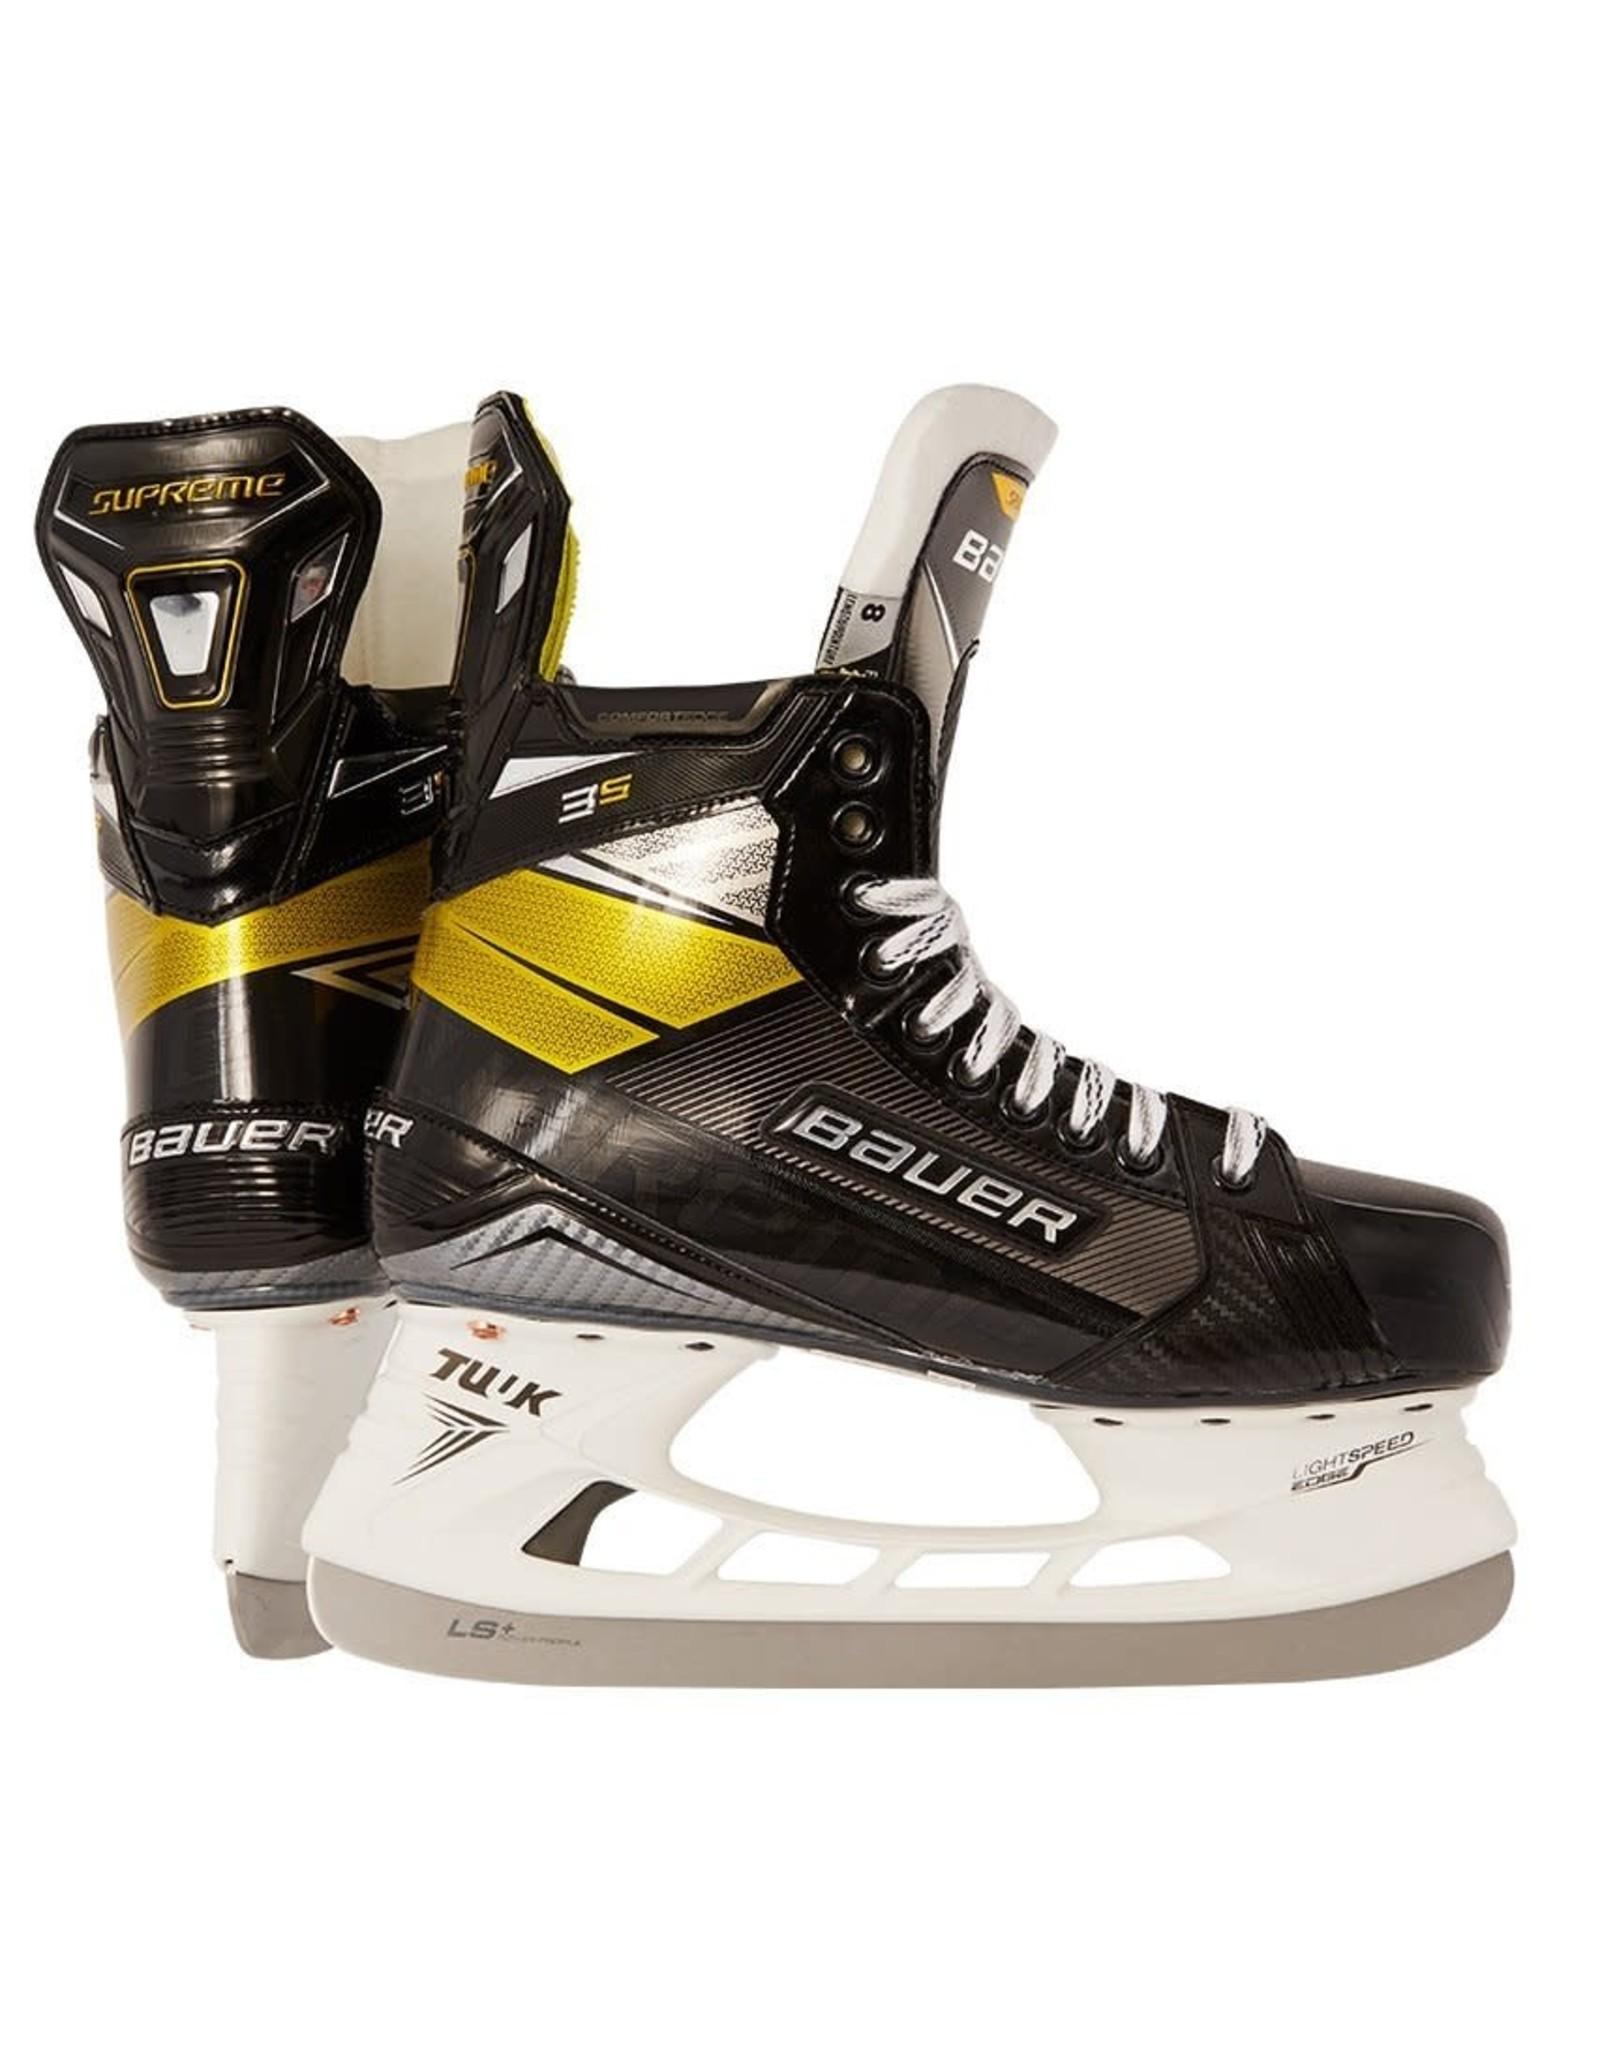 BAUER Supreme 3S, Intermediate Hockey Skate